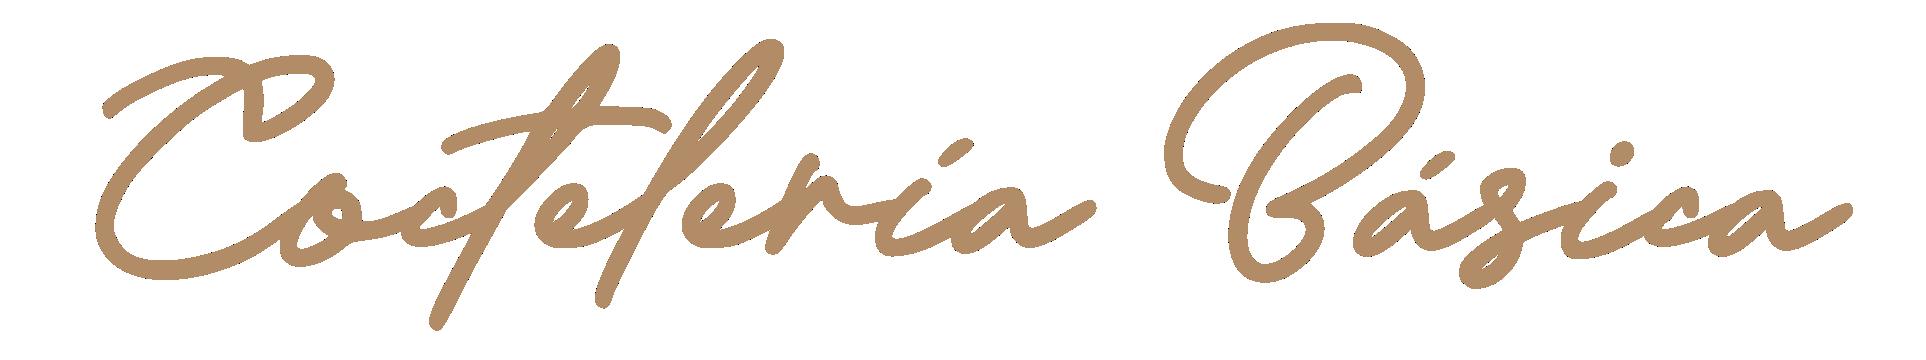 https://tequila1921.com/wp-content/uploads/2020/02/1921_cocteleria_basica.png